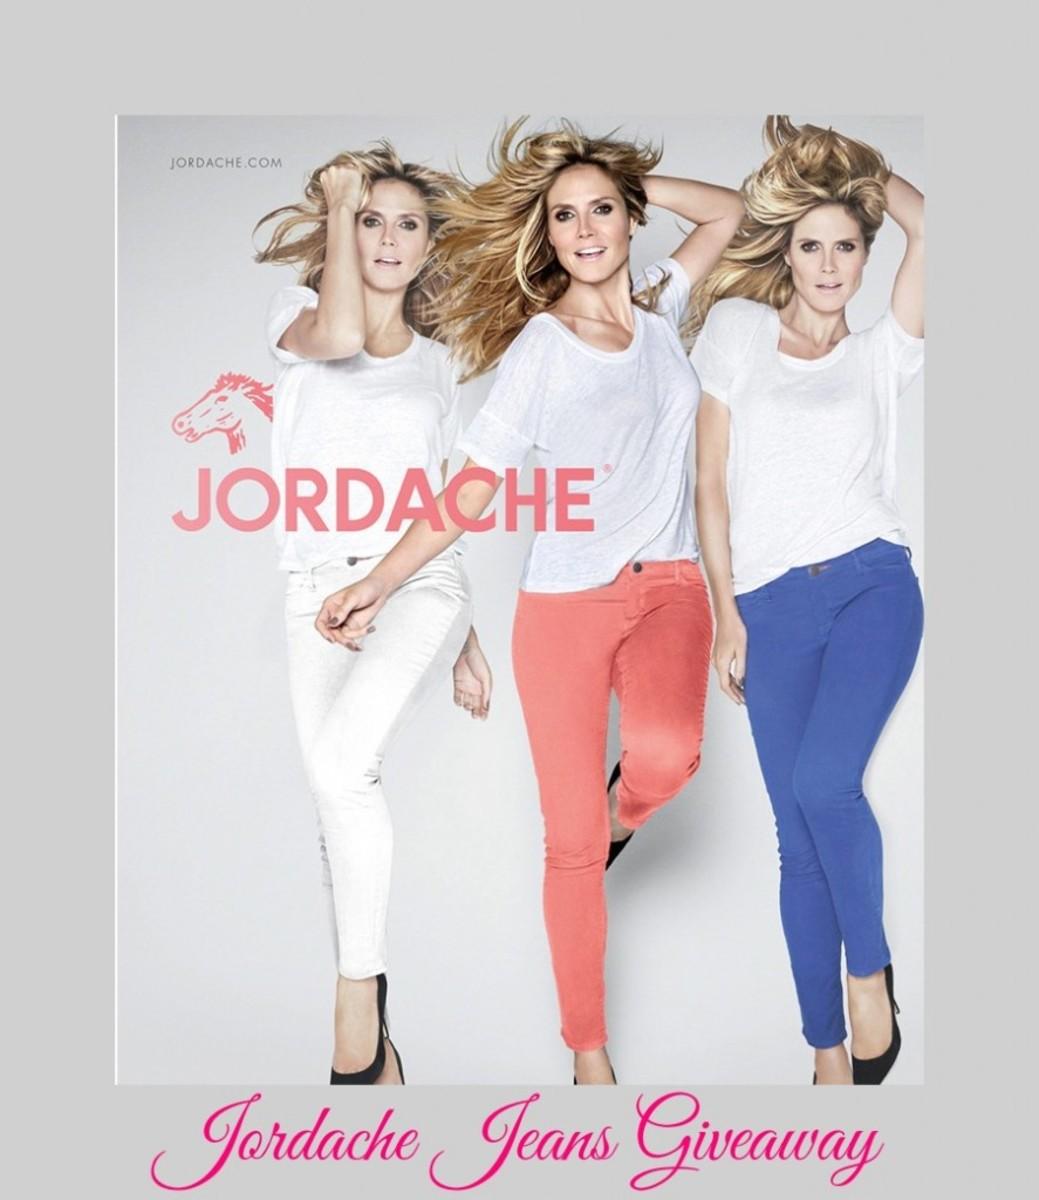 Jordache-Jeans-Giveaway--887x1024